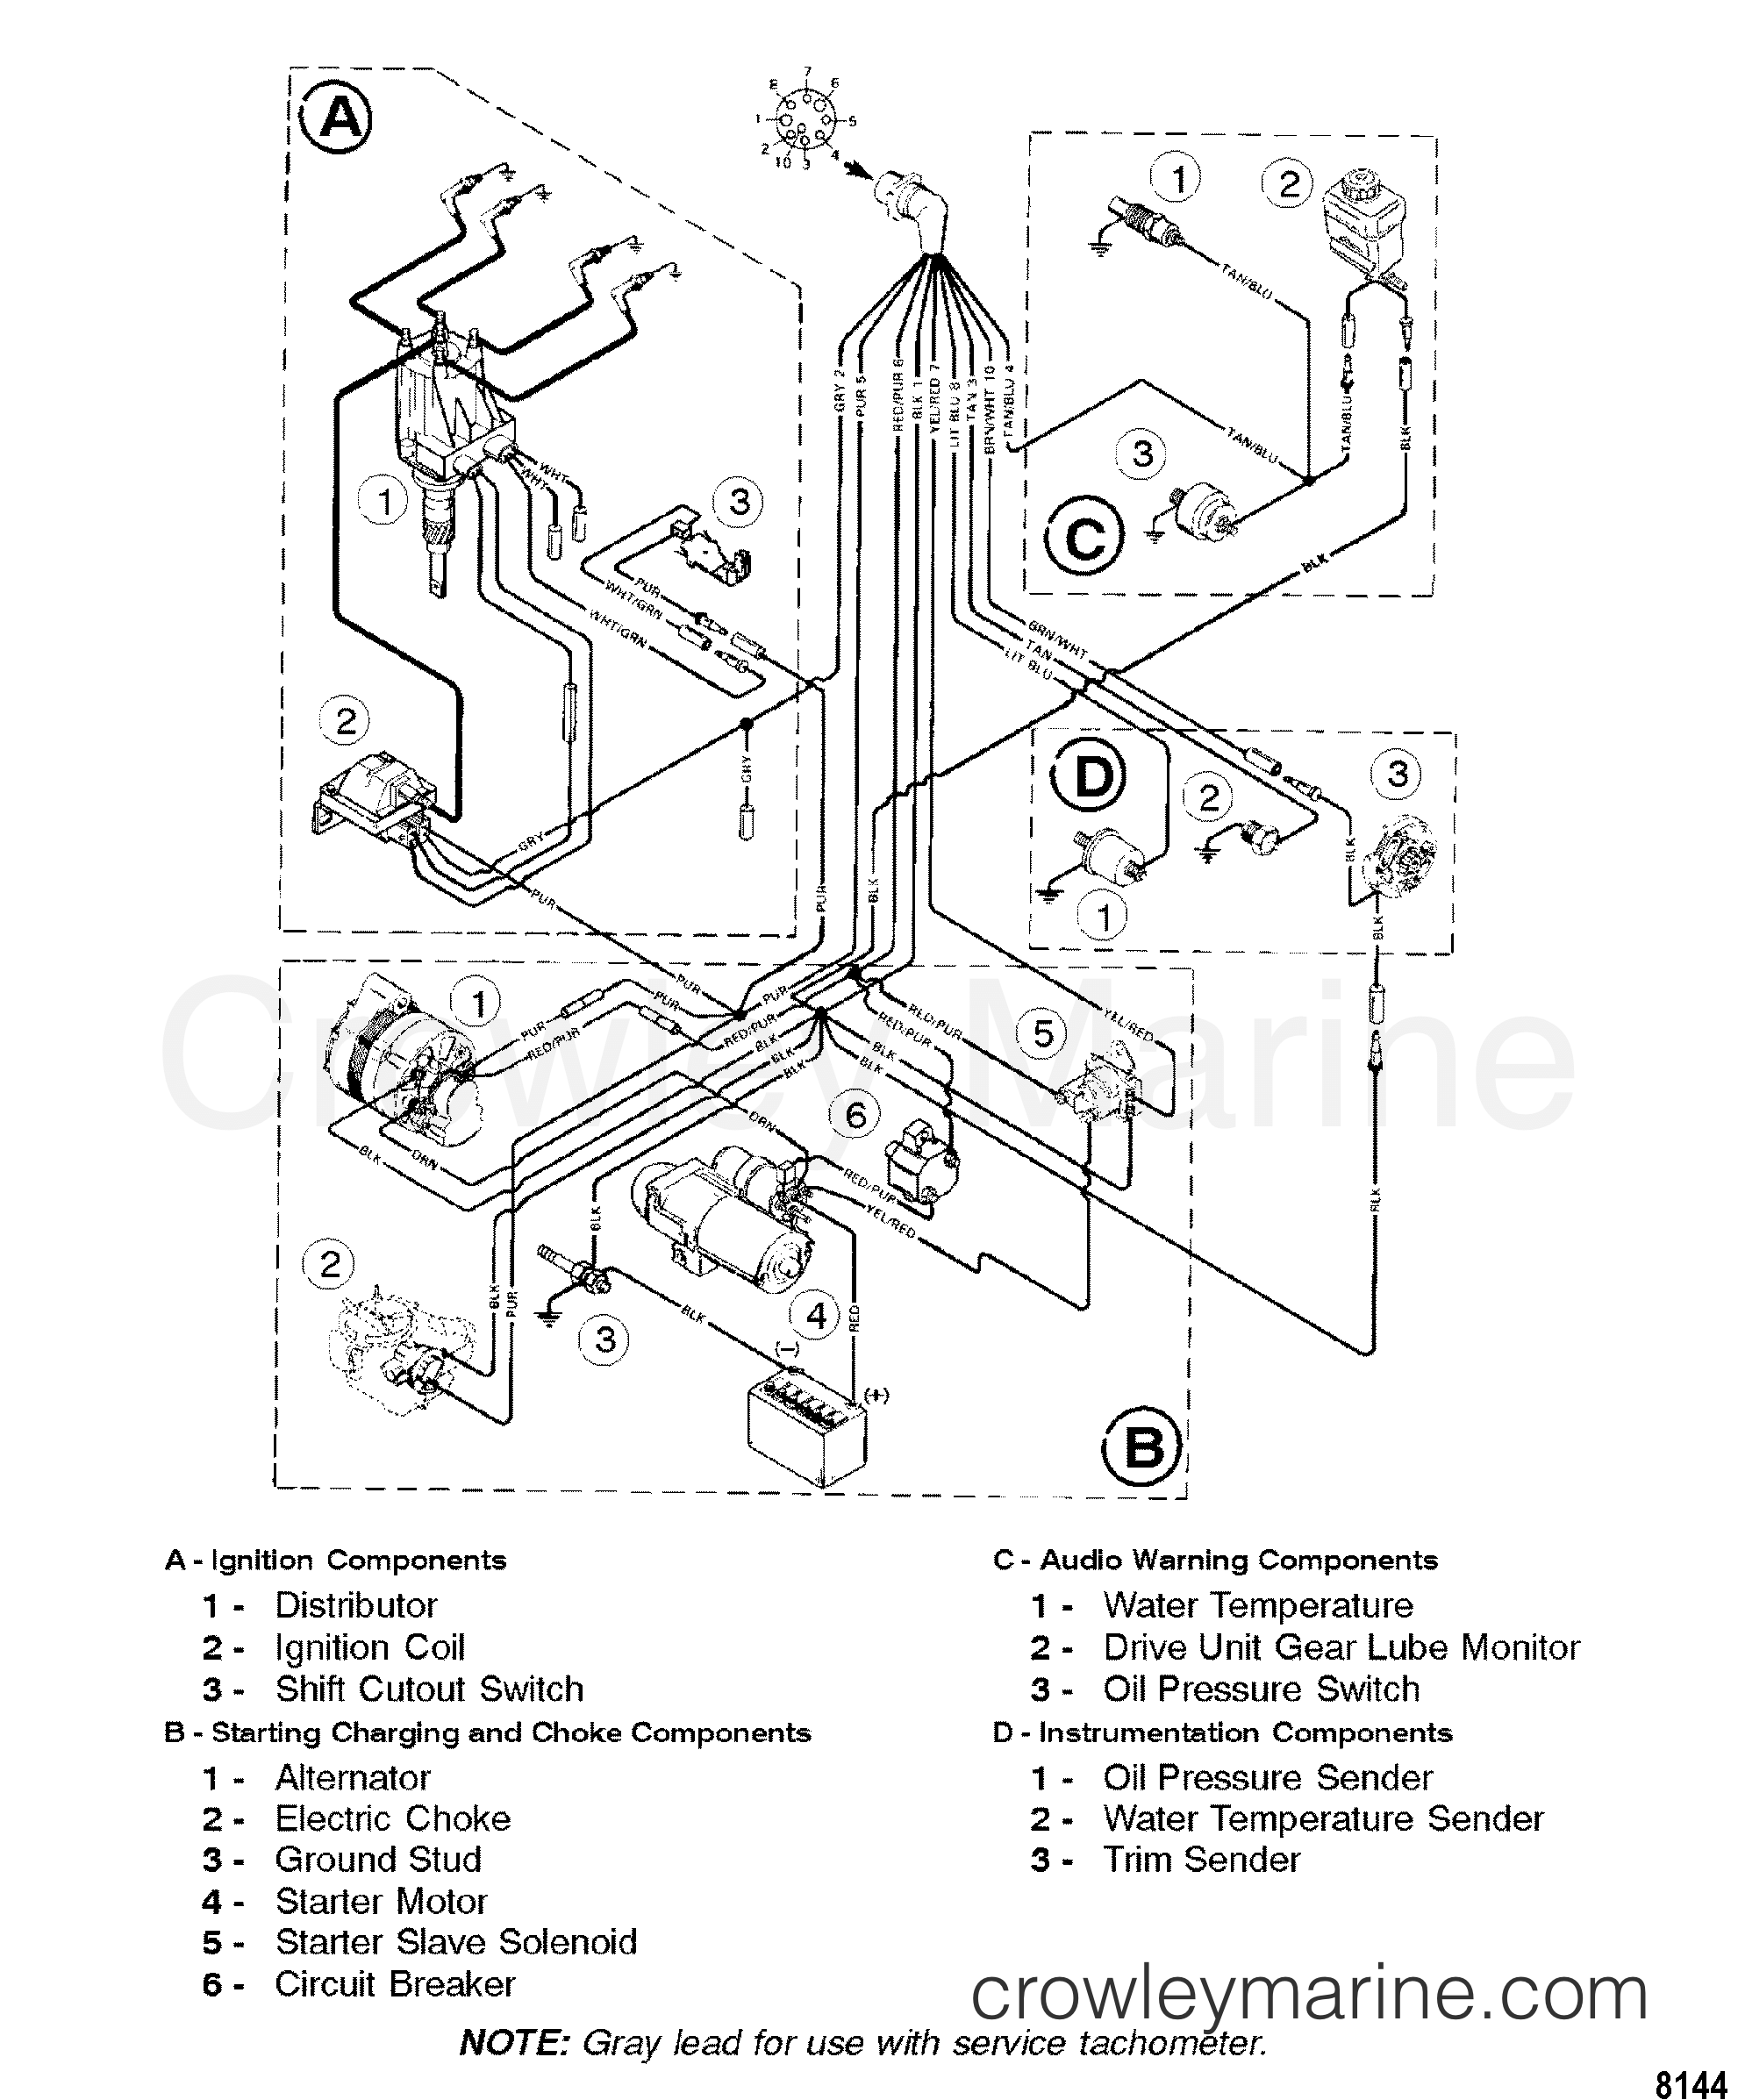 1998 Mercruiser 3.0L [ALPHA] - 4111021L1 - WIRING HARNESS section